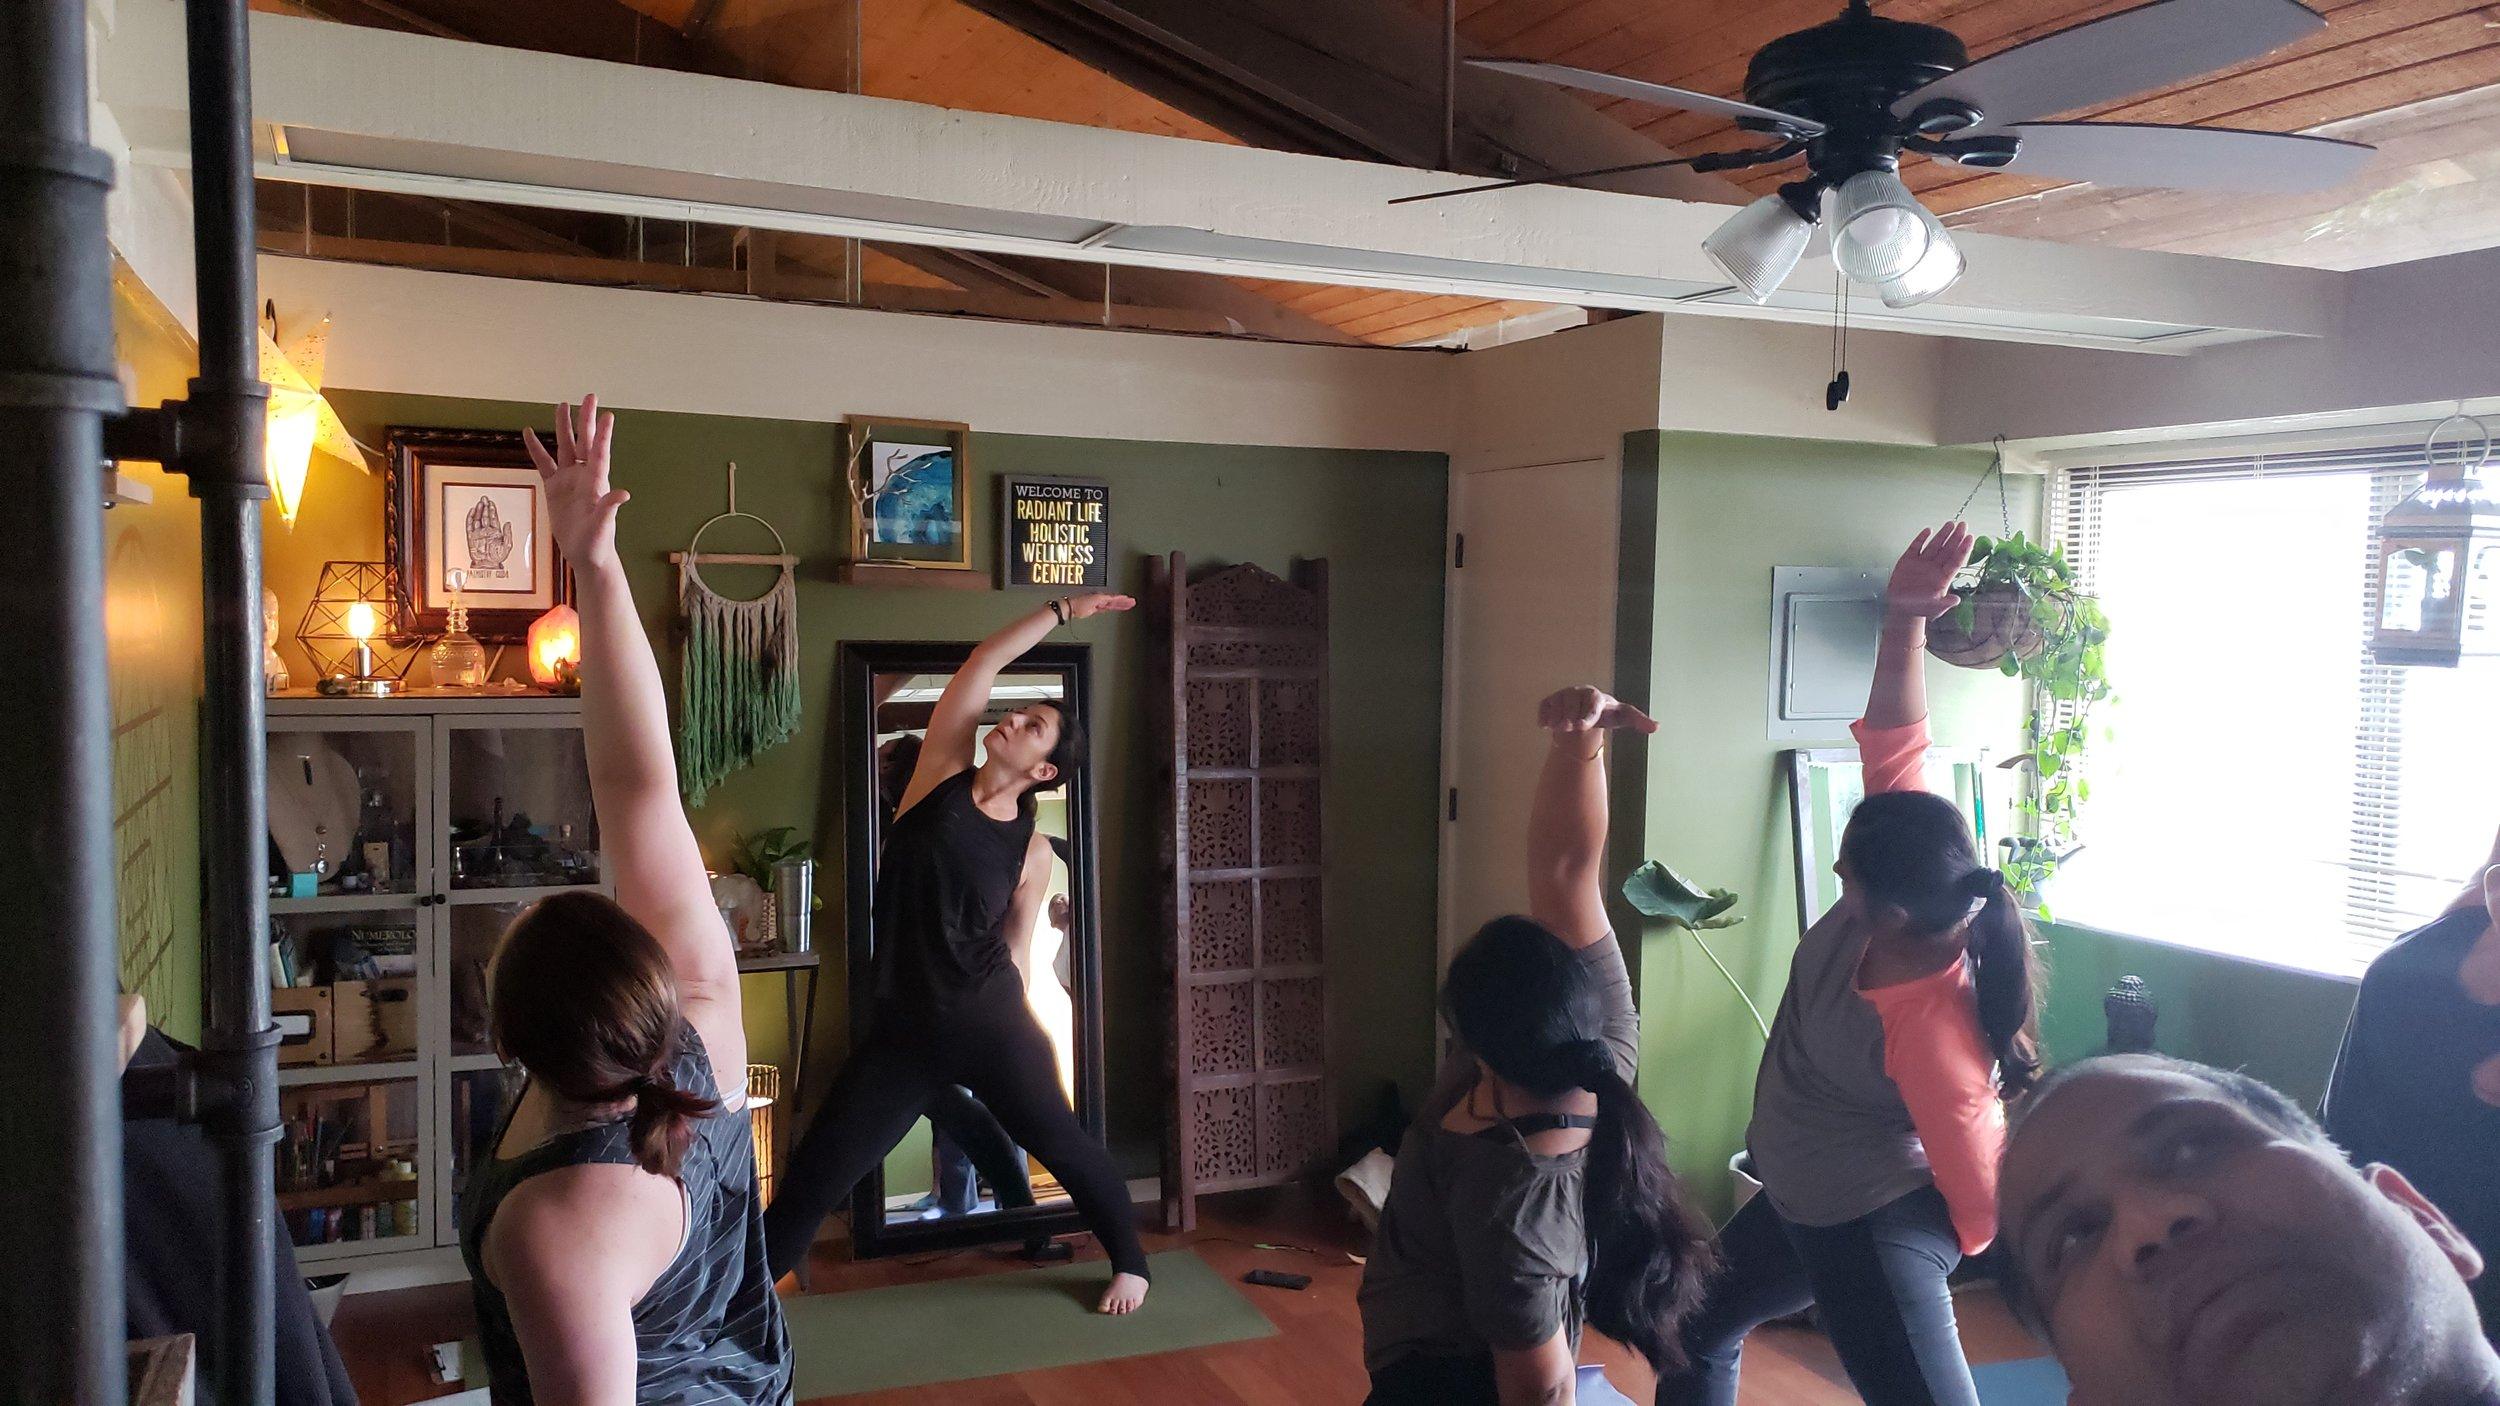 Gina LaBarbera - Beginner Vinyasa Flow Yoga Class